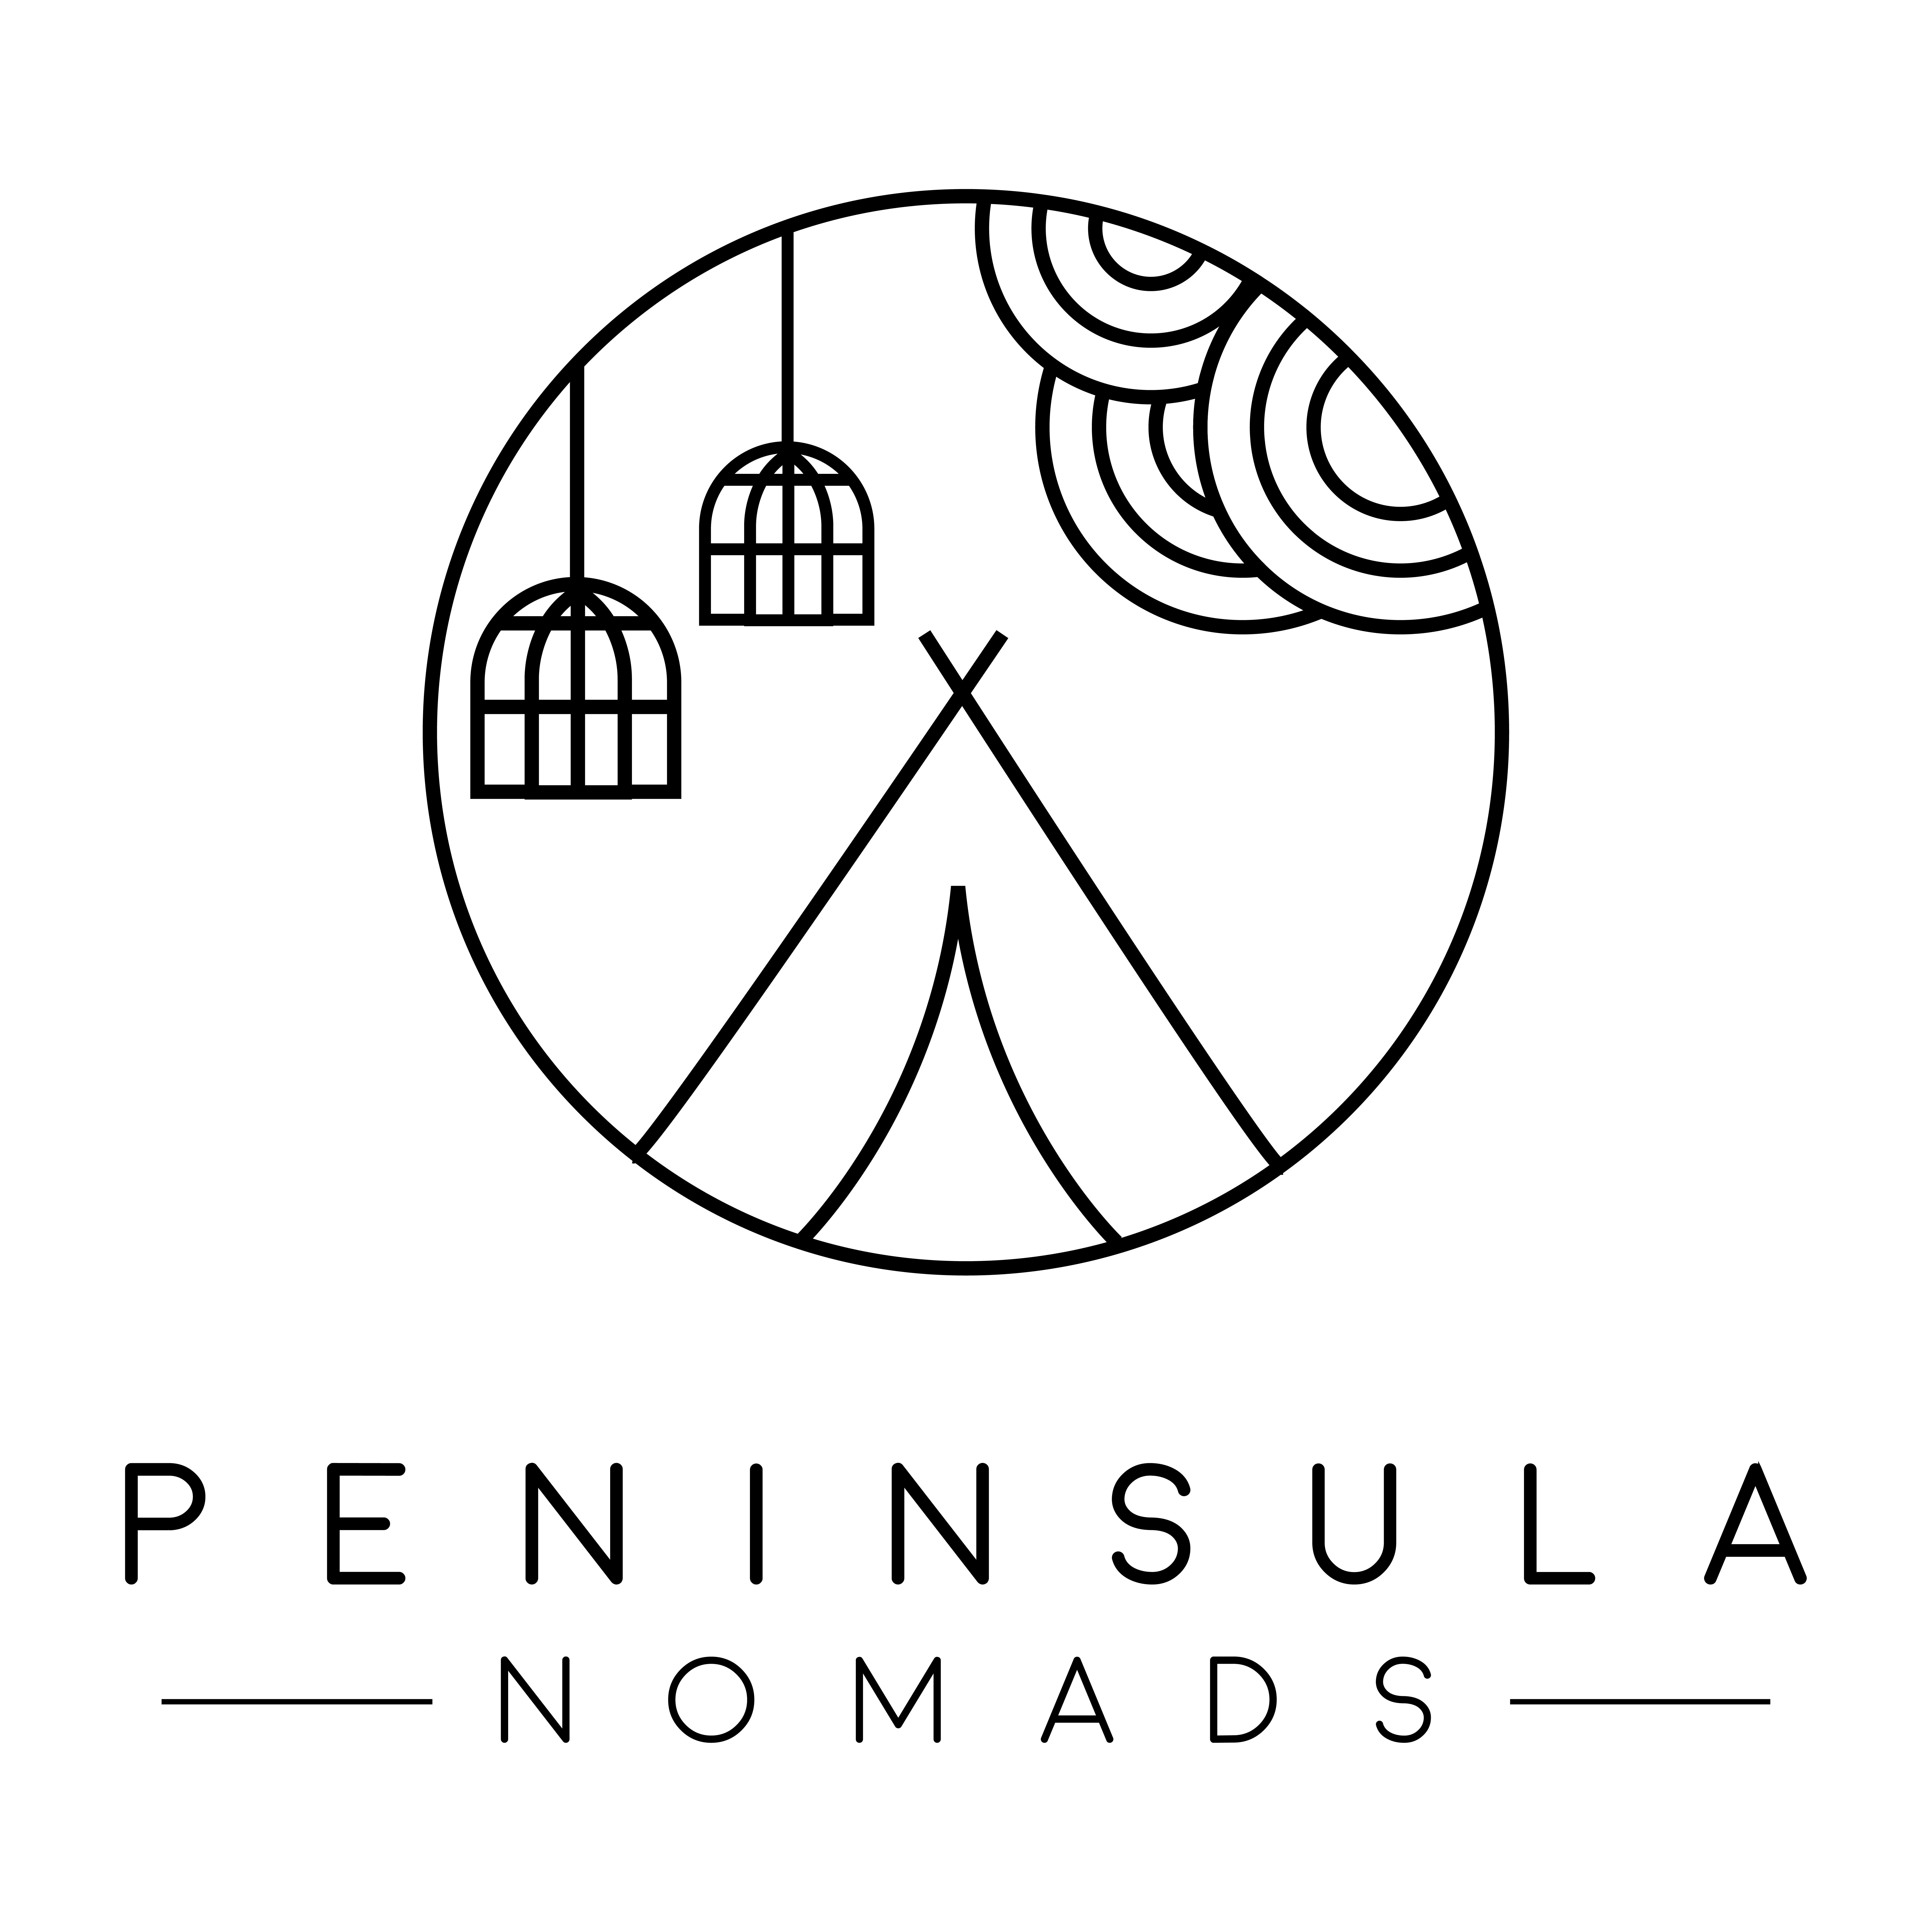 PN standard logo_black text